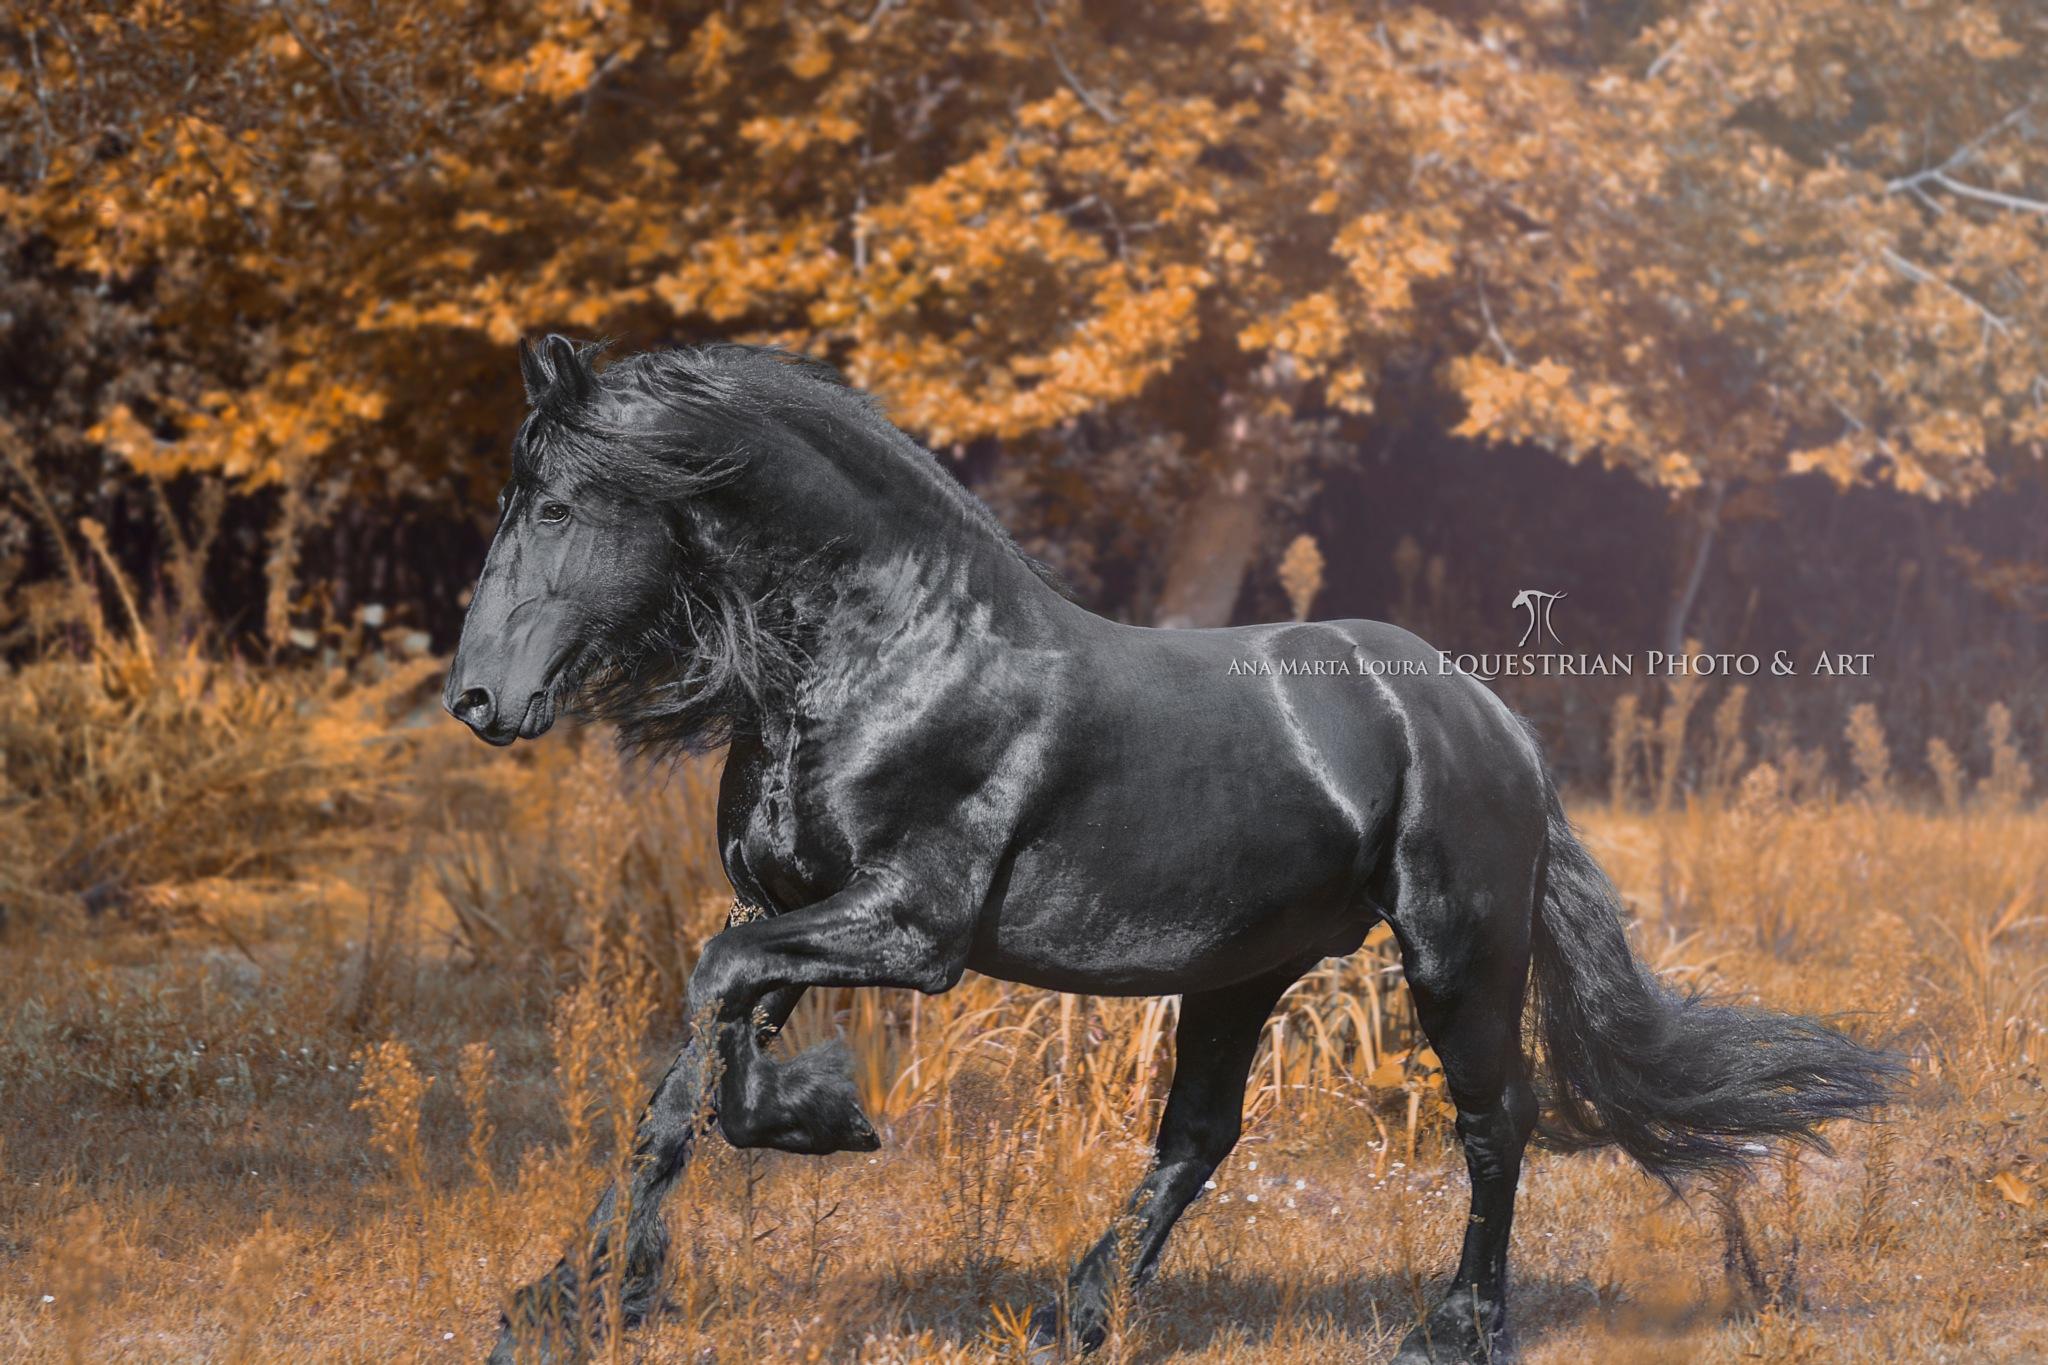 Friesian Stallion by Ana Marta Loura Equestrian Productions